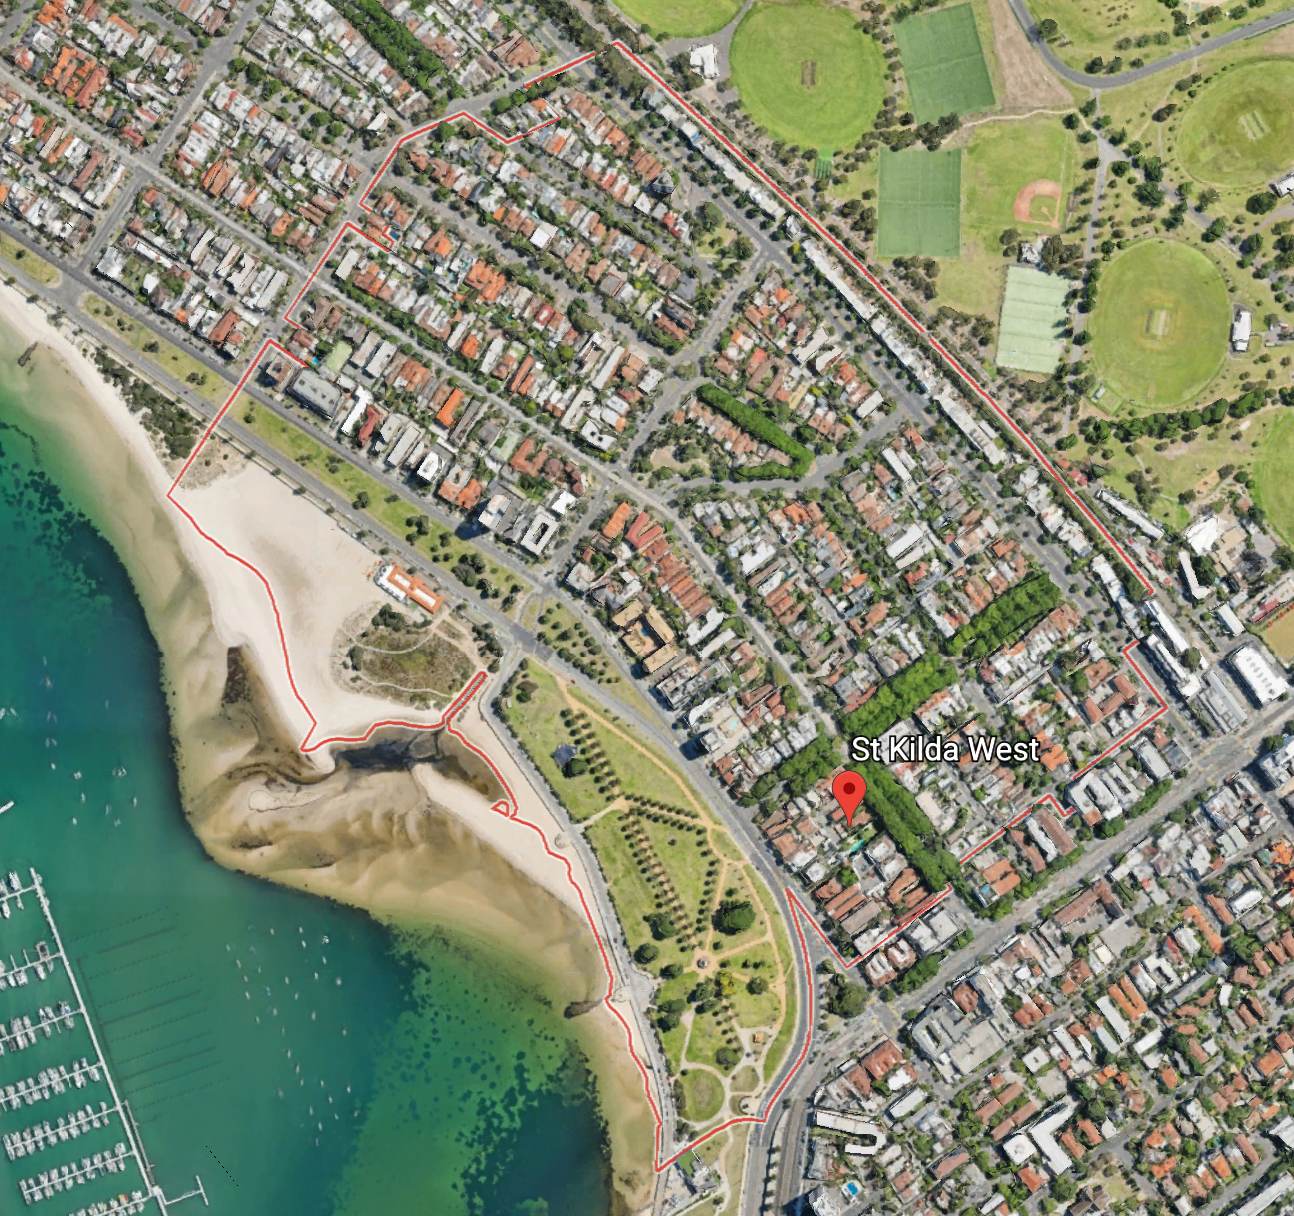 St. Kilda West, Melbourne, Australia